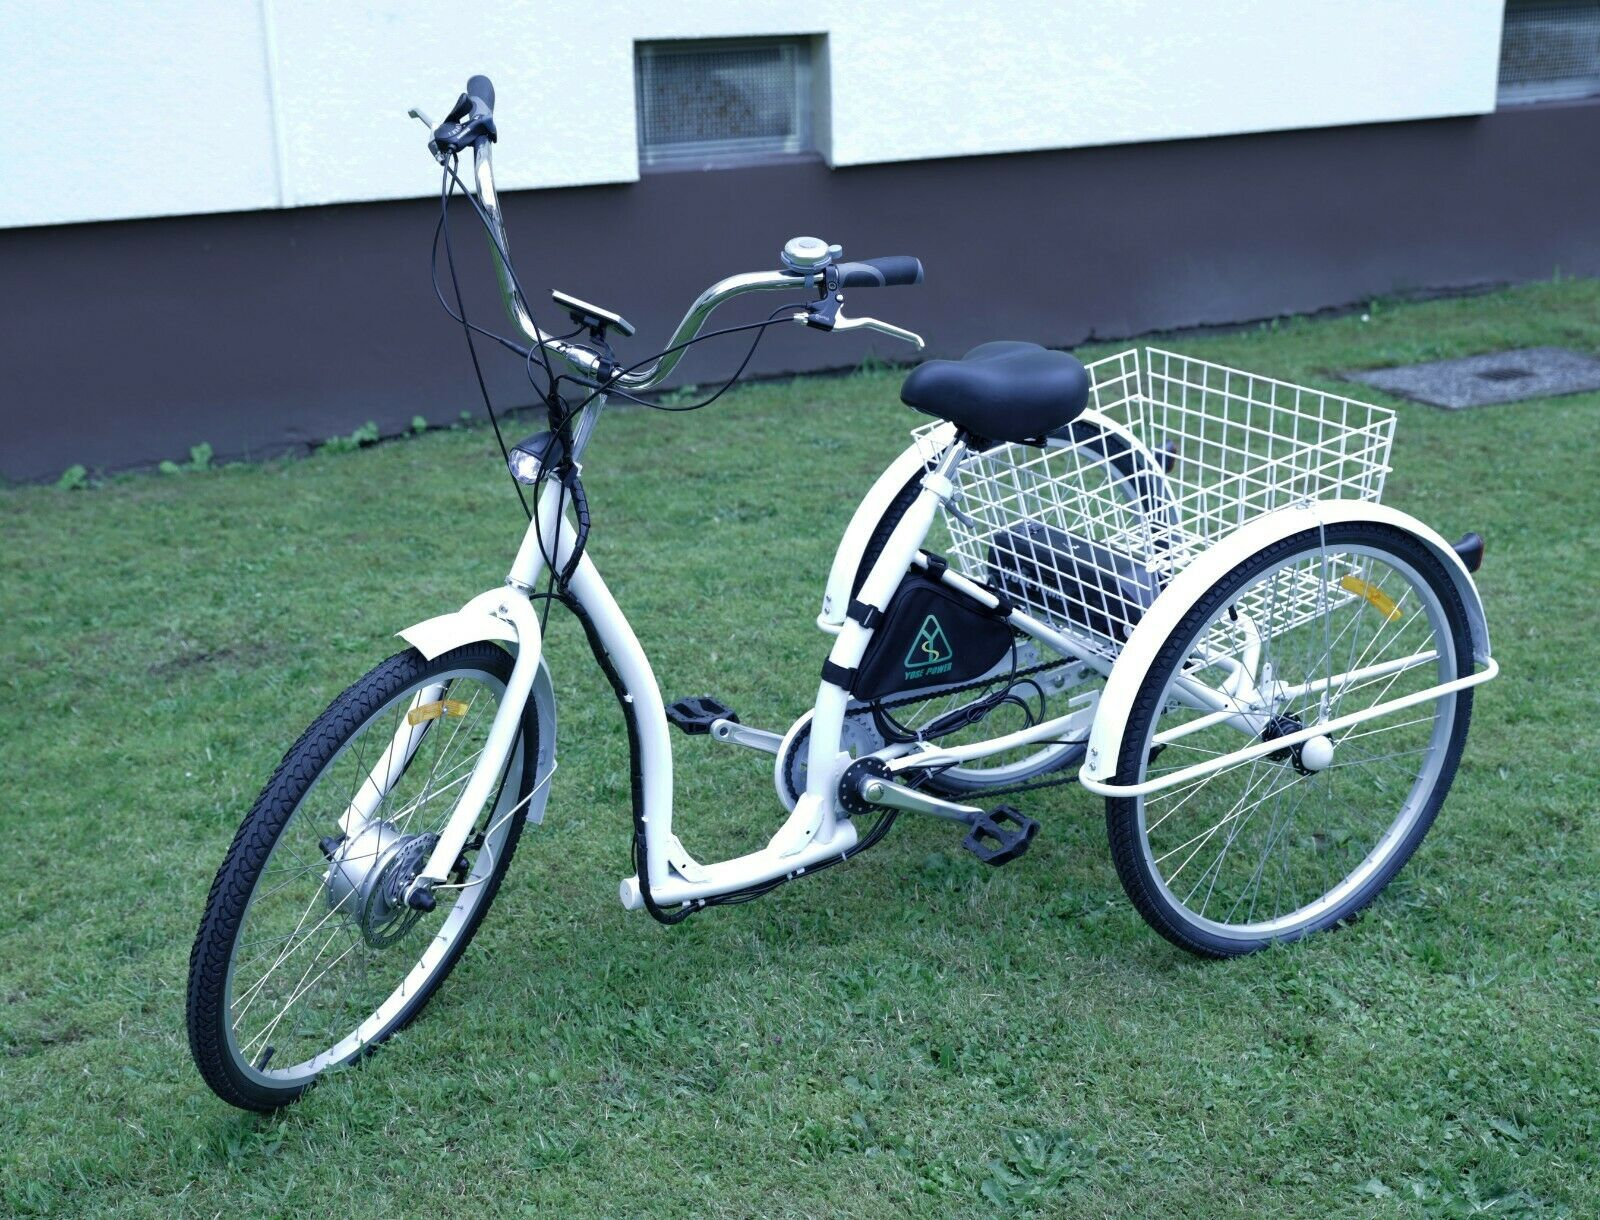 E-Bike Dreirad Elektrofahrrad 36V-250W, absolut NEU, selbst zusammengebaut!